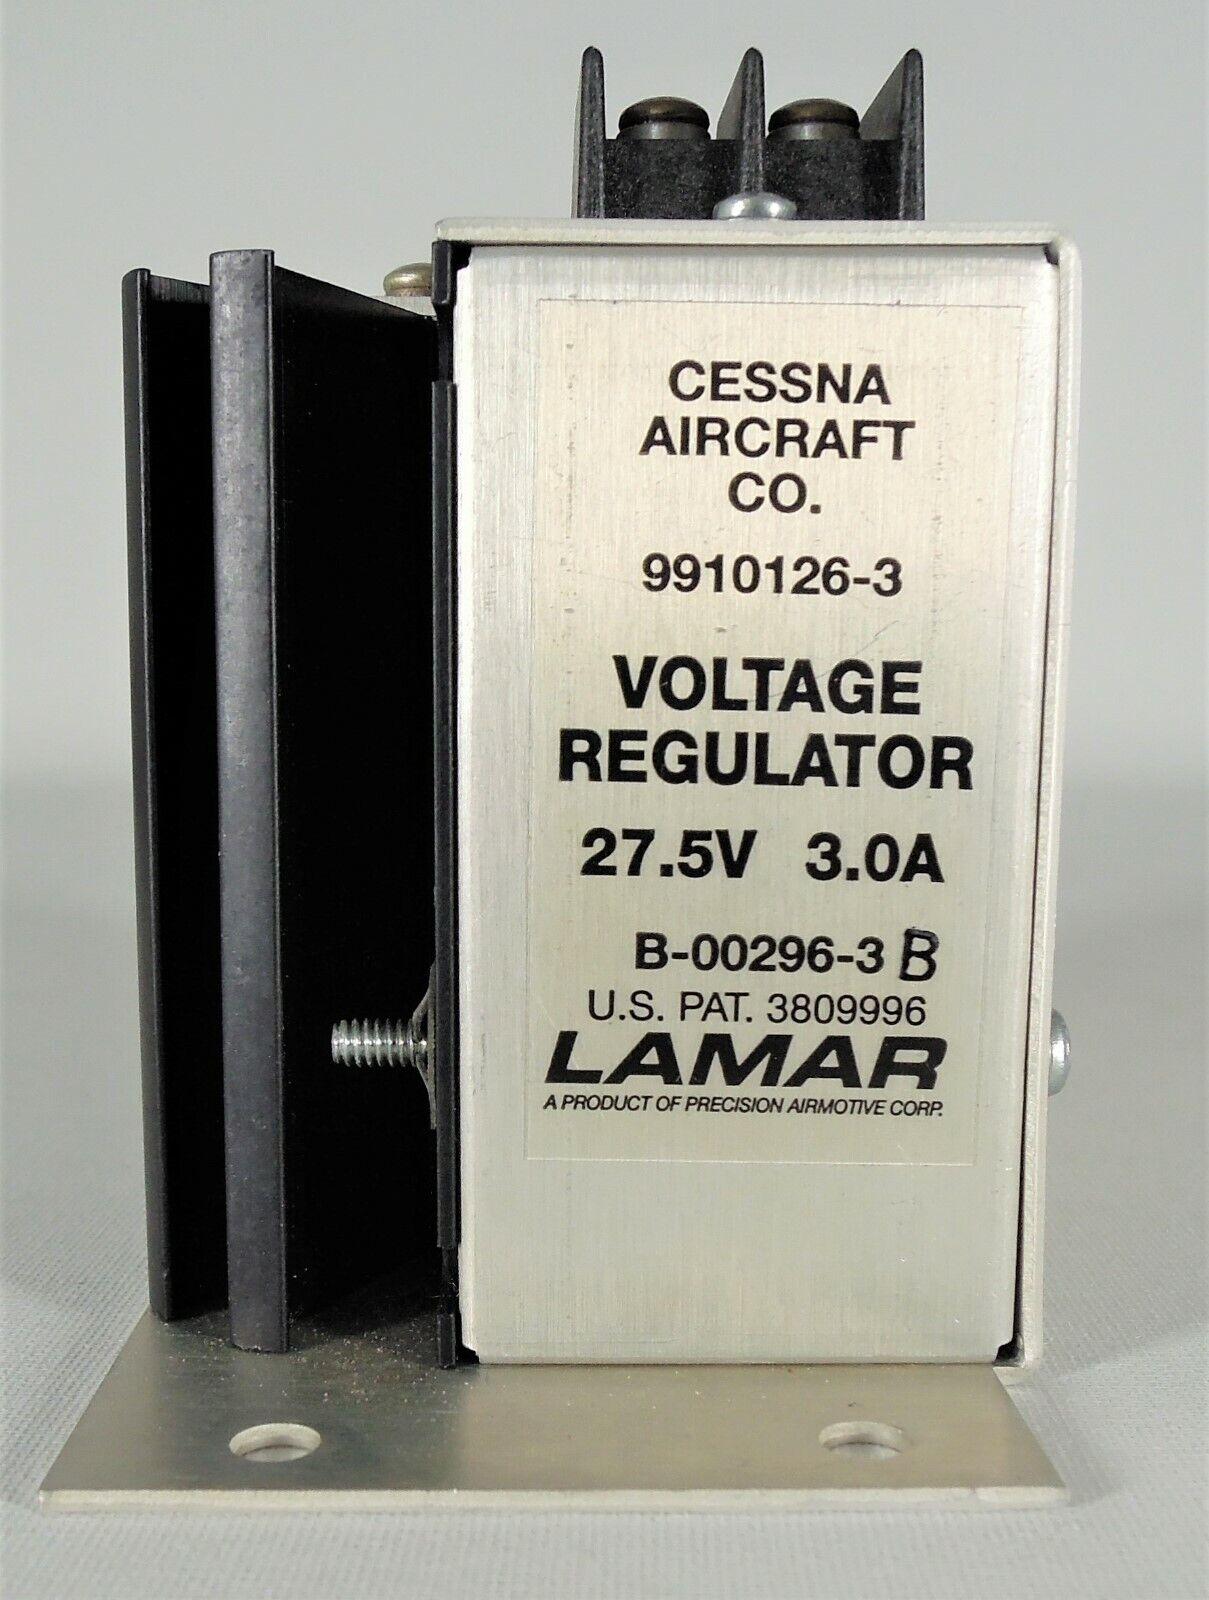 Cessna Voltage Regulator ohne Zertifikat  NEU  aus Lagerauflösung PN 9910126-3